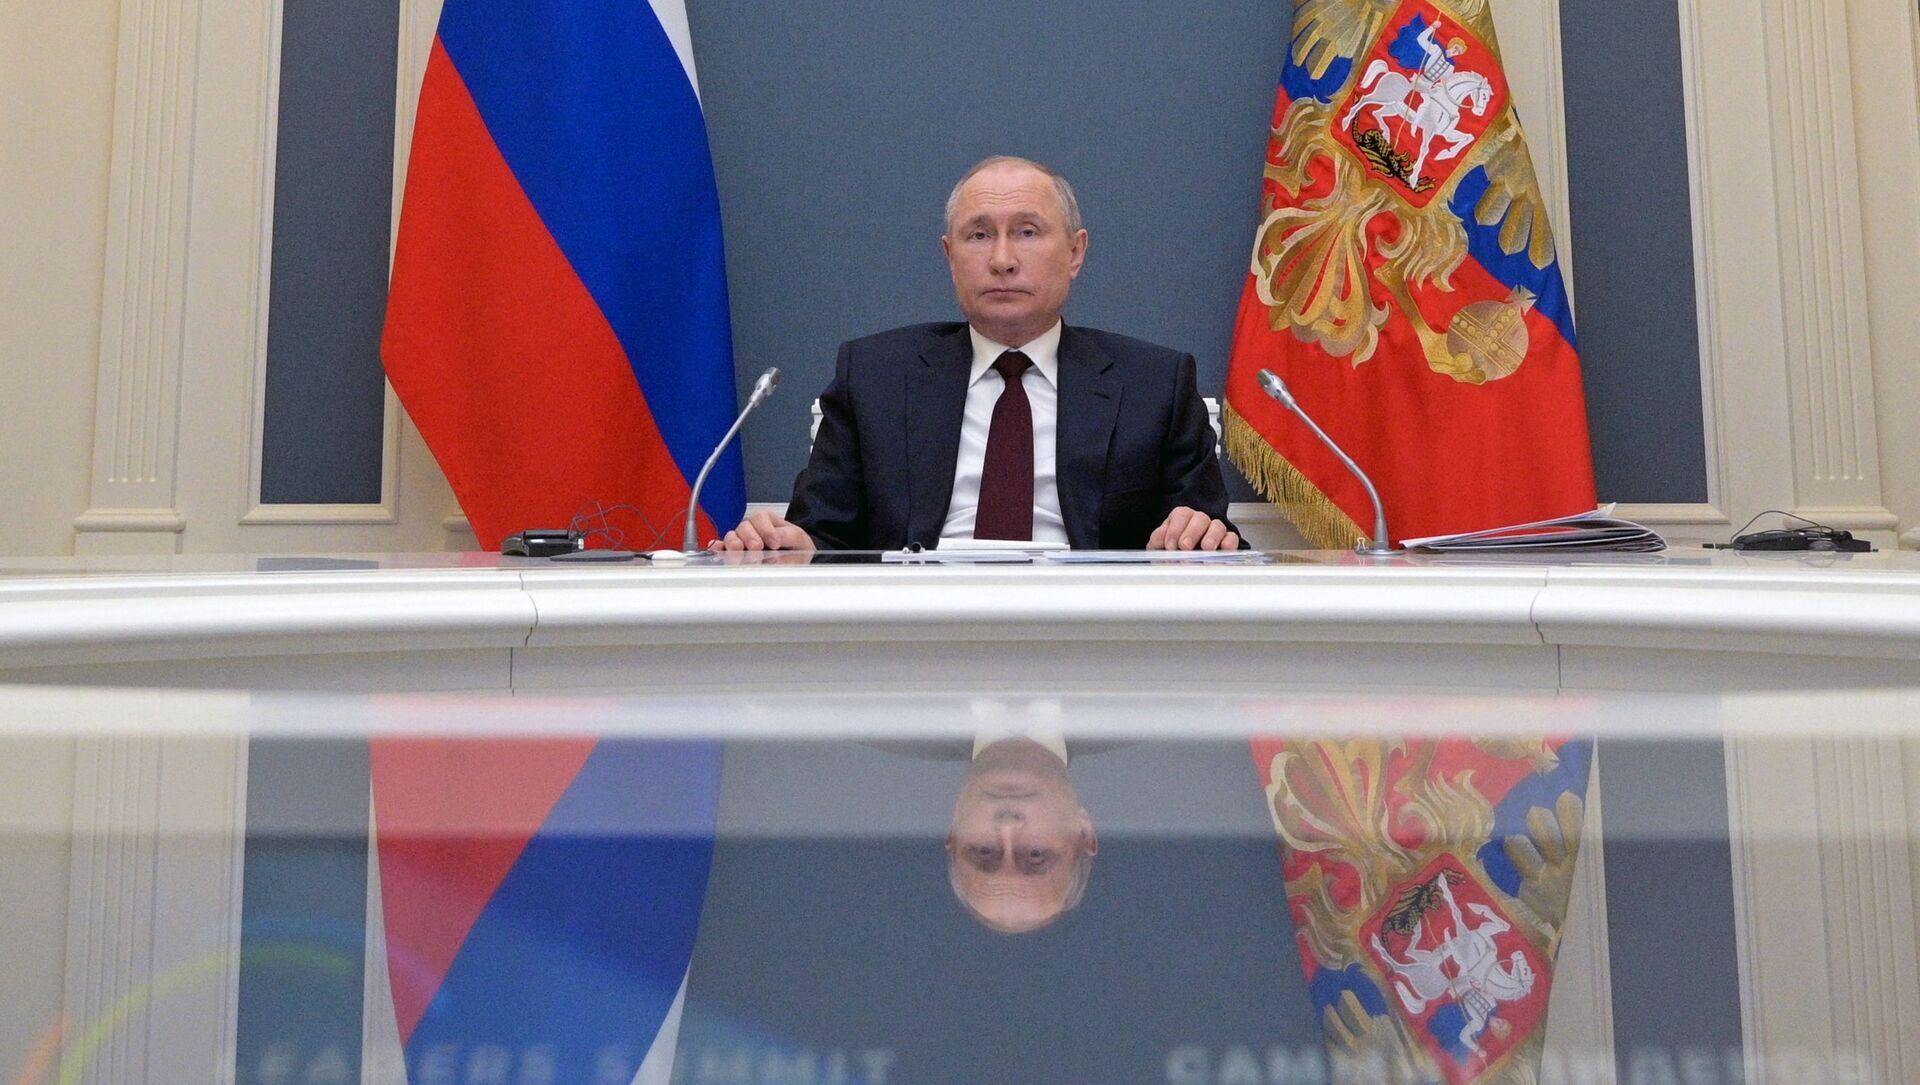 Il presidente russo Vladimir Putin - Sputnik Italia, 1920, 23.04.2021